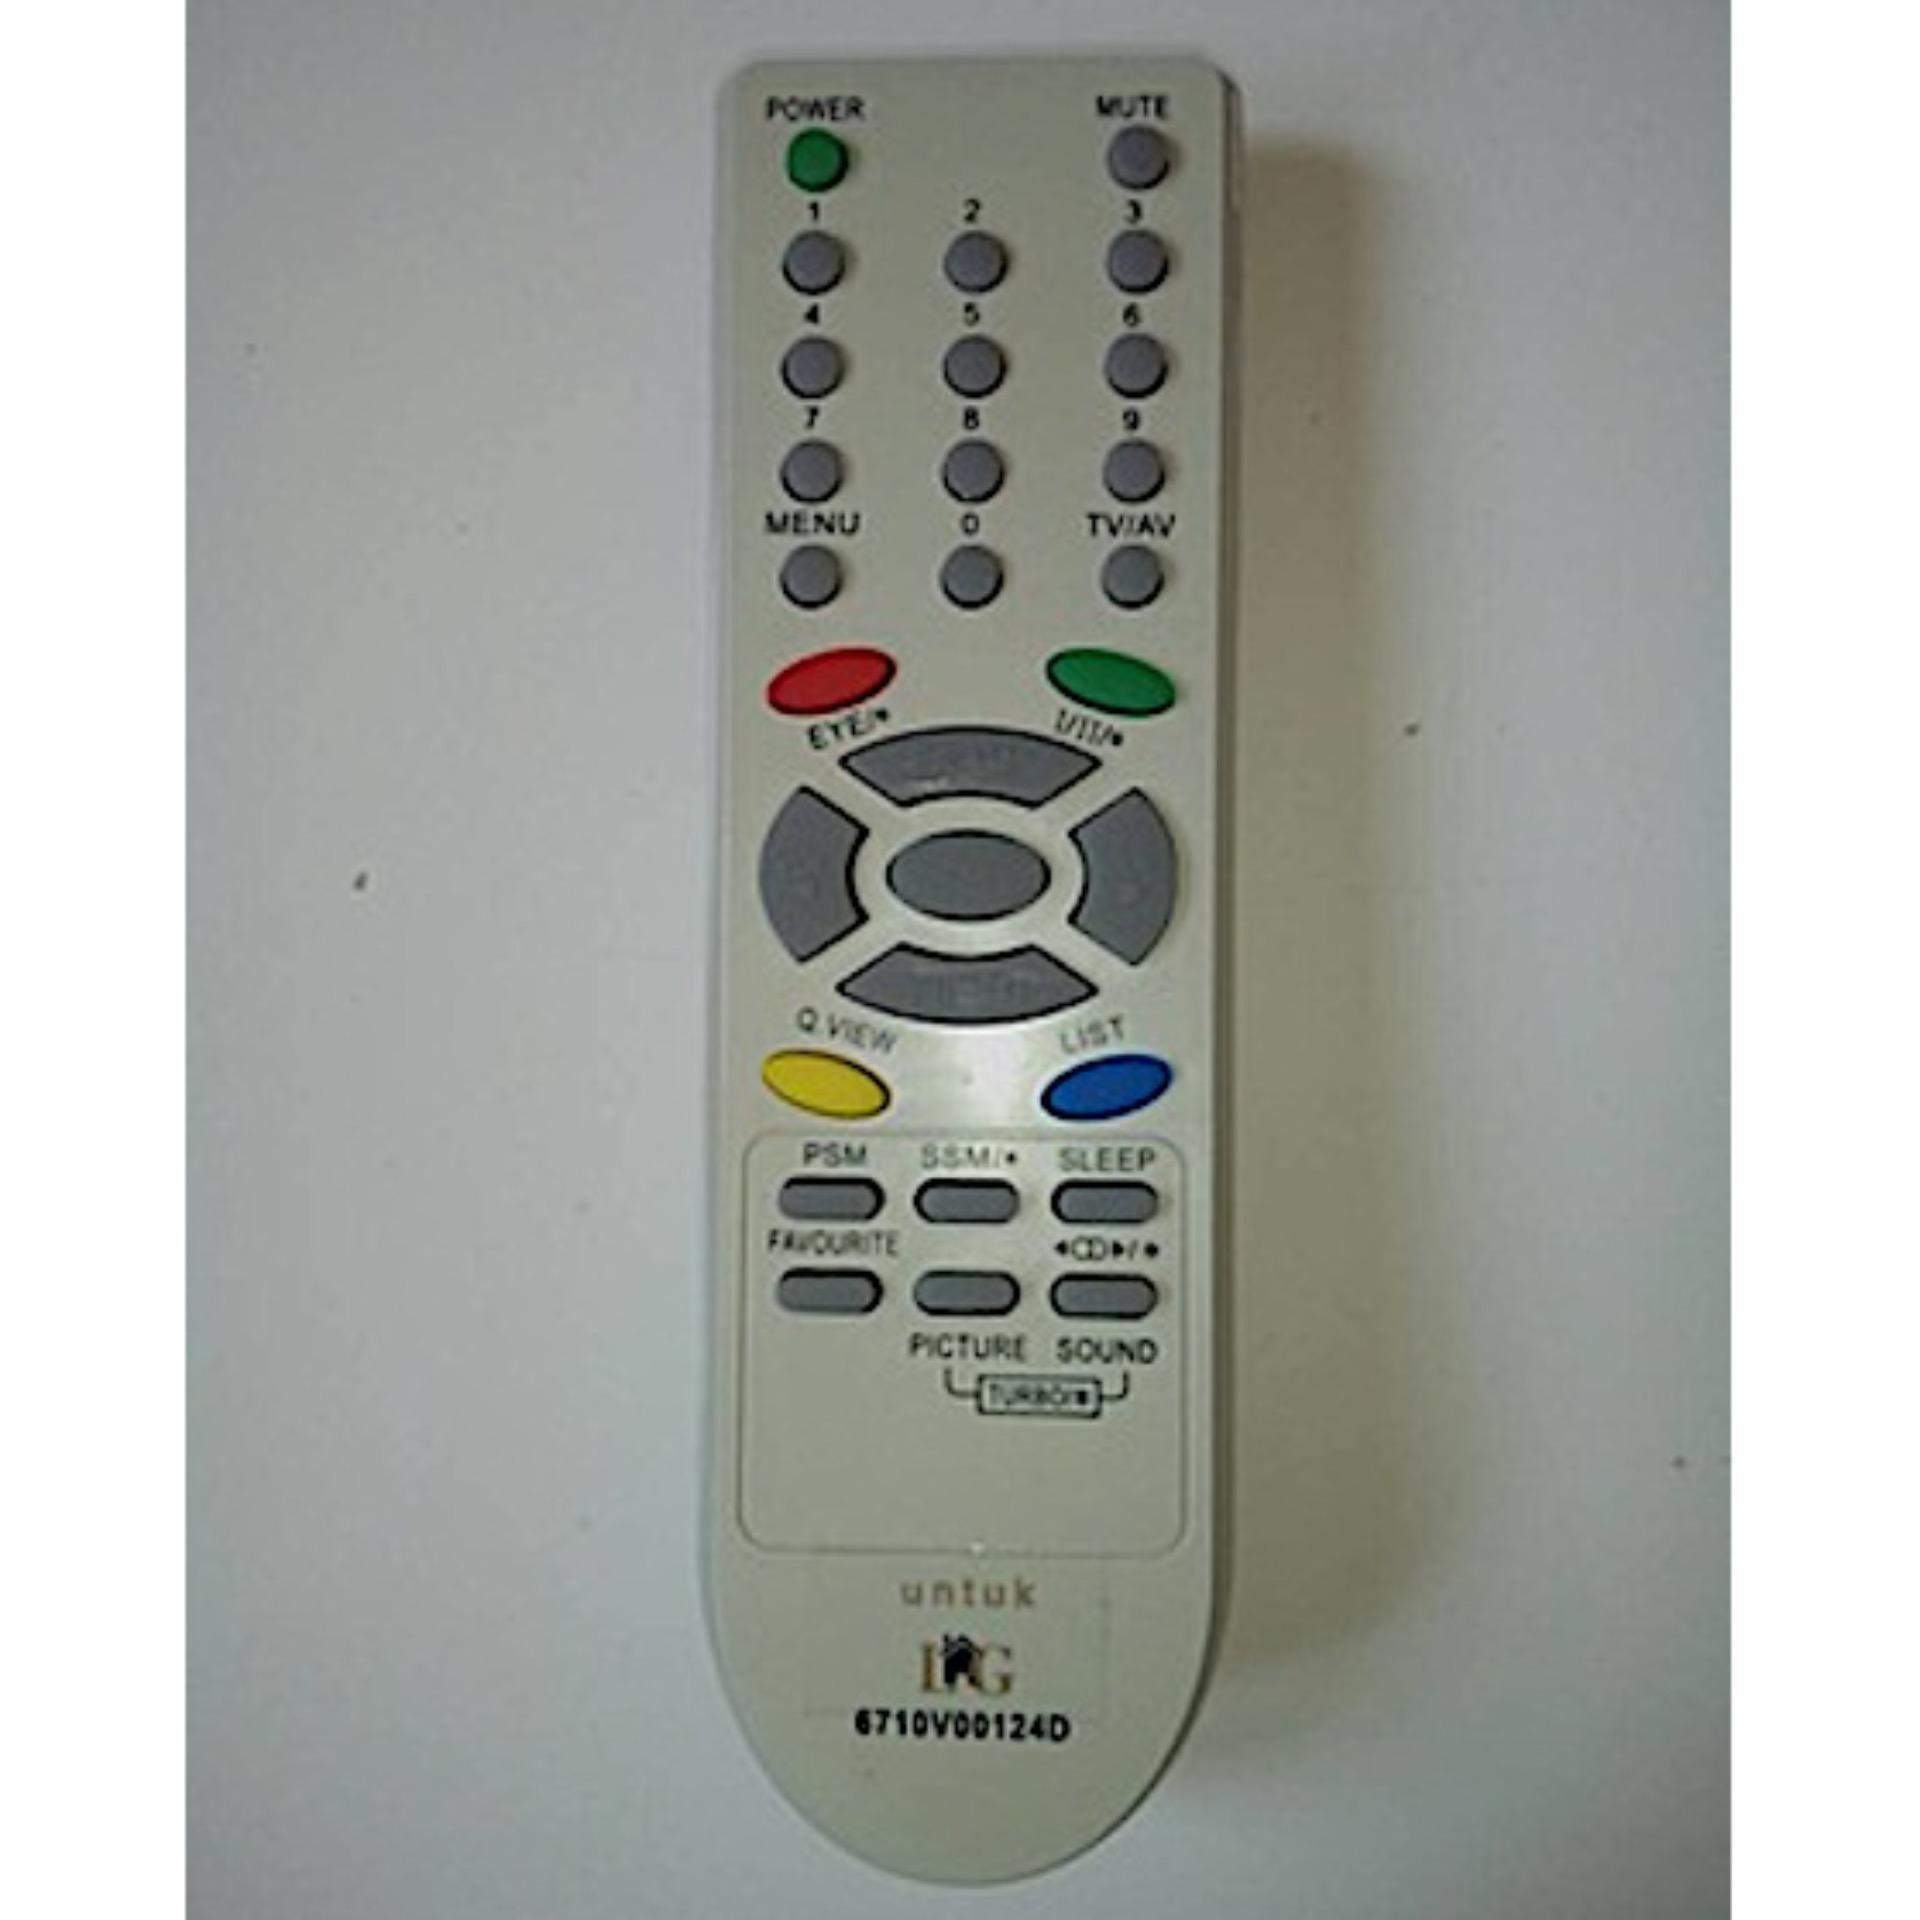 Cheap online LG Remote TV Tabung 6710V00124D - Putih